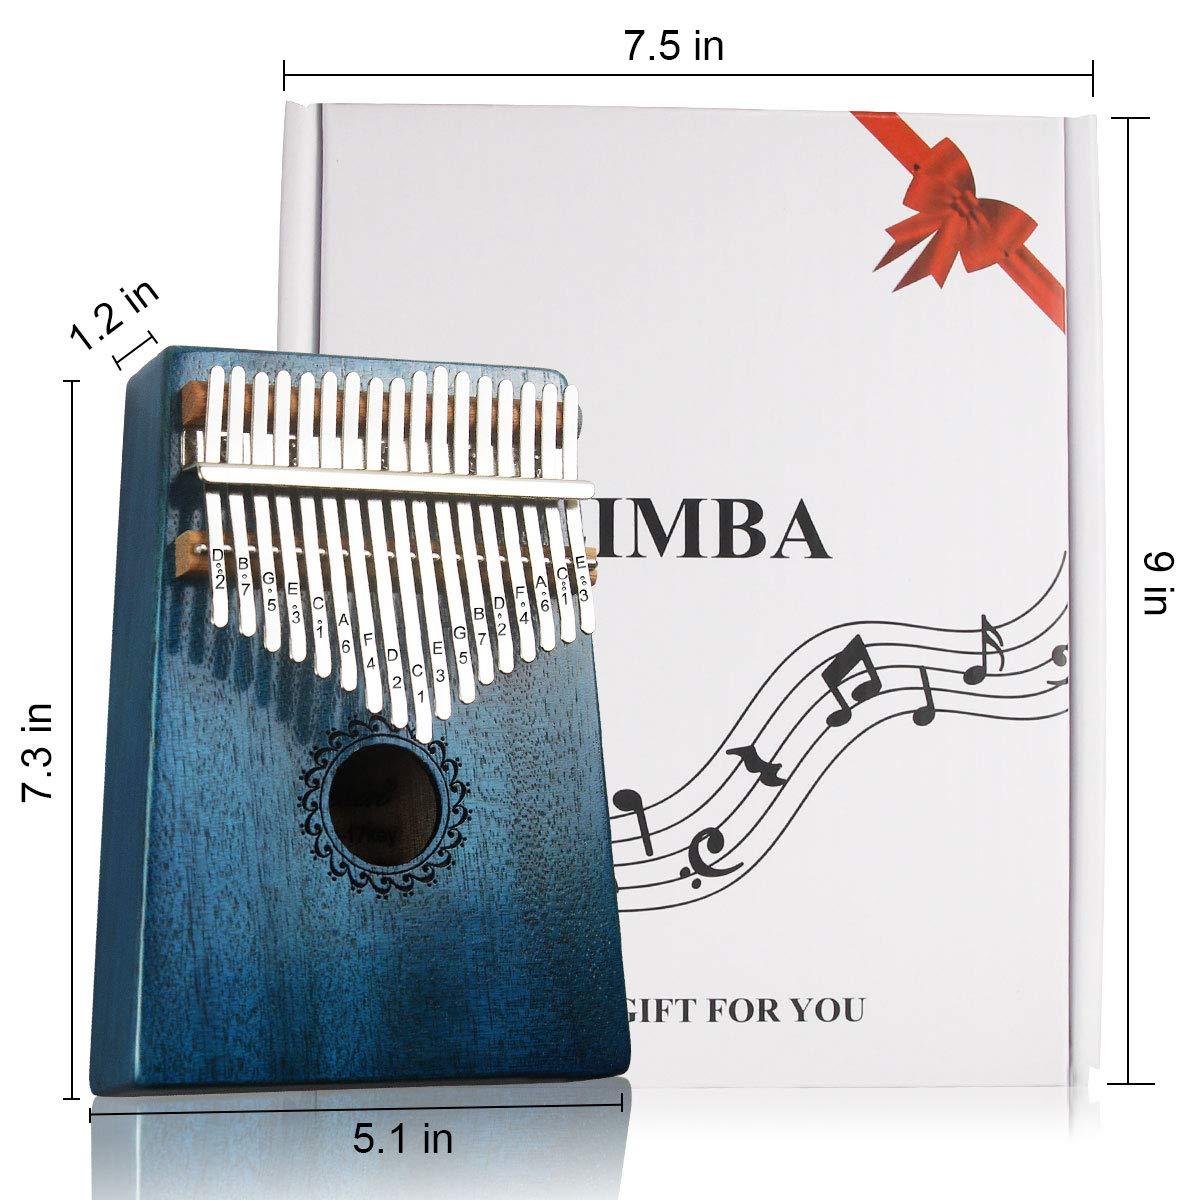 Kalimba 17 Key Thumb Piano with Mahogany Wood Portable Mbira Finger Piano Gifts for Kids and Piano Beginners Professional (Blue)